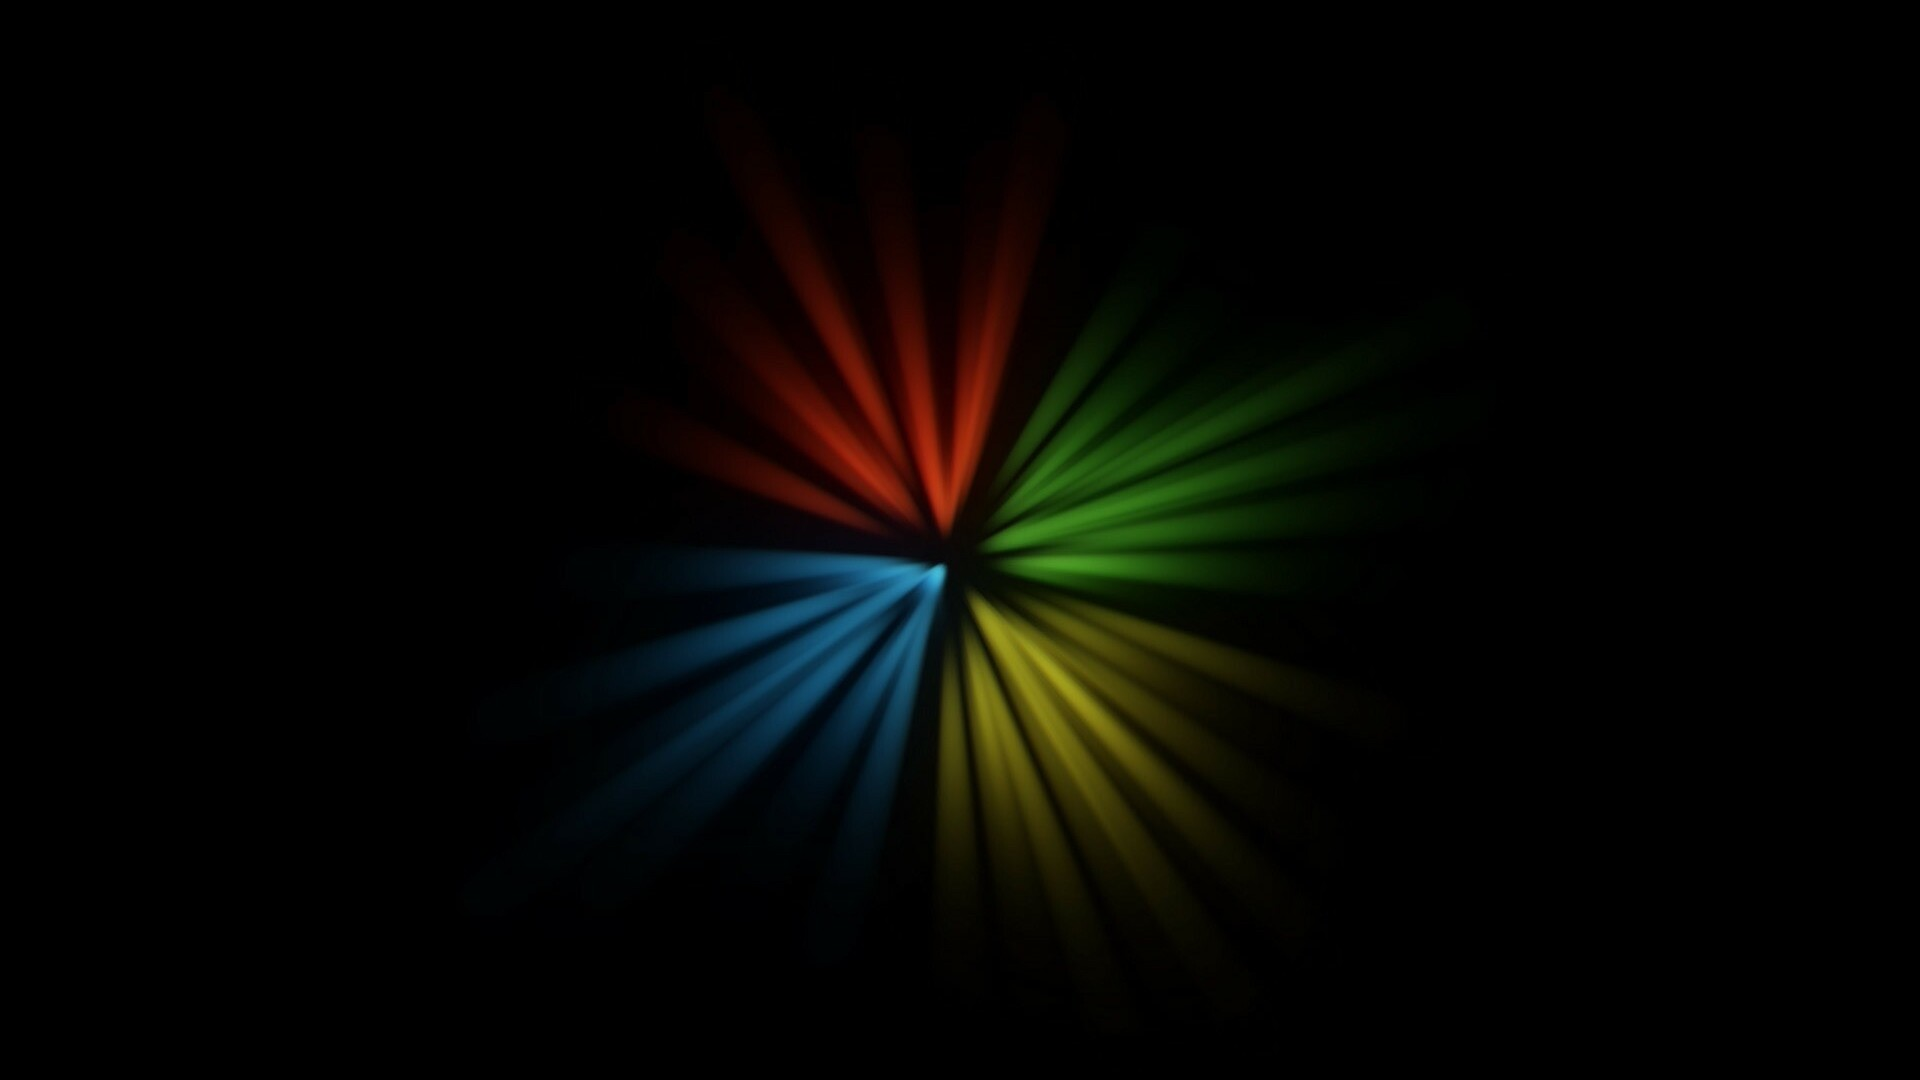 windows_yellow_black_blue_green_red_31055_1920x1080.jpg